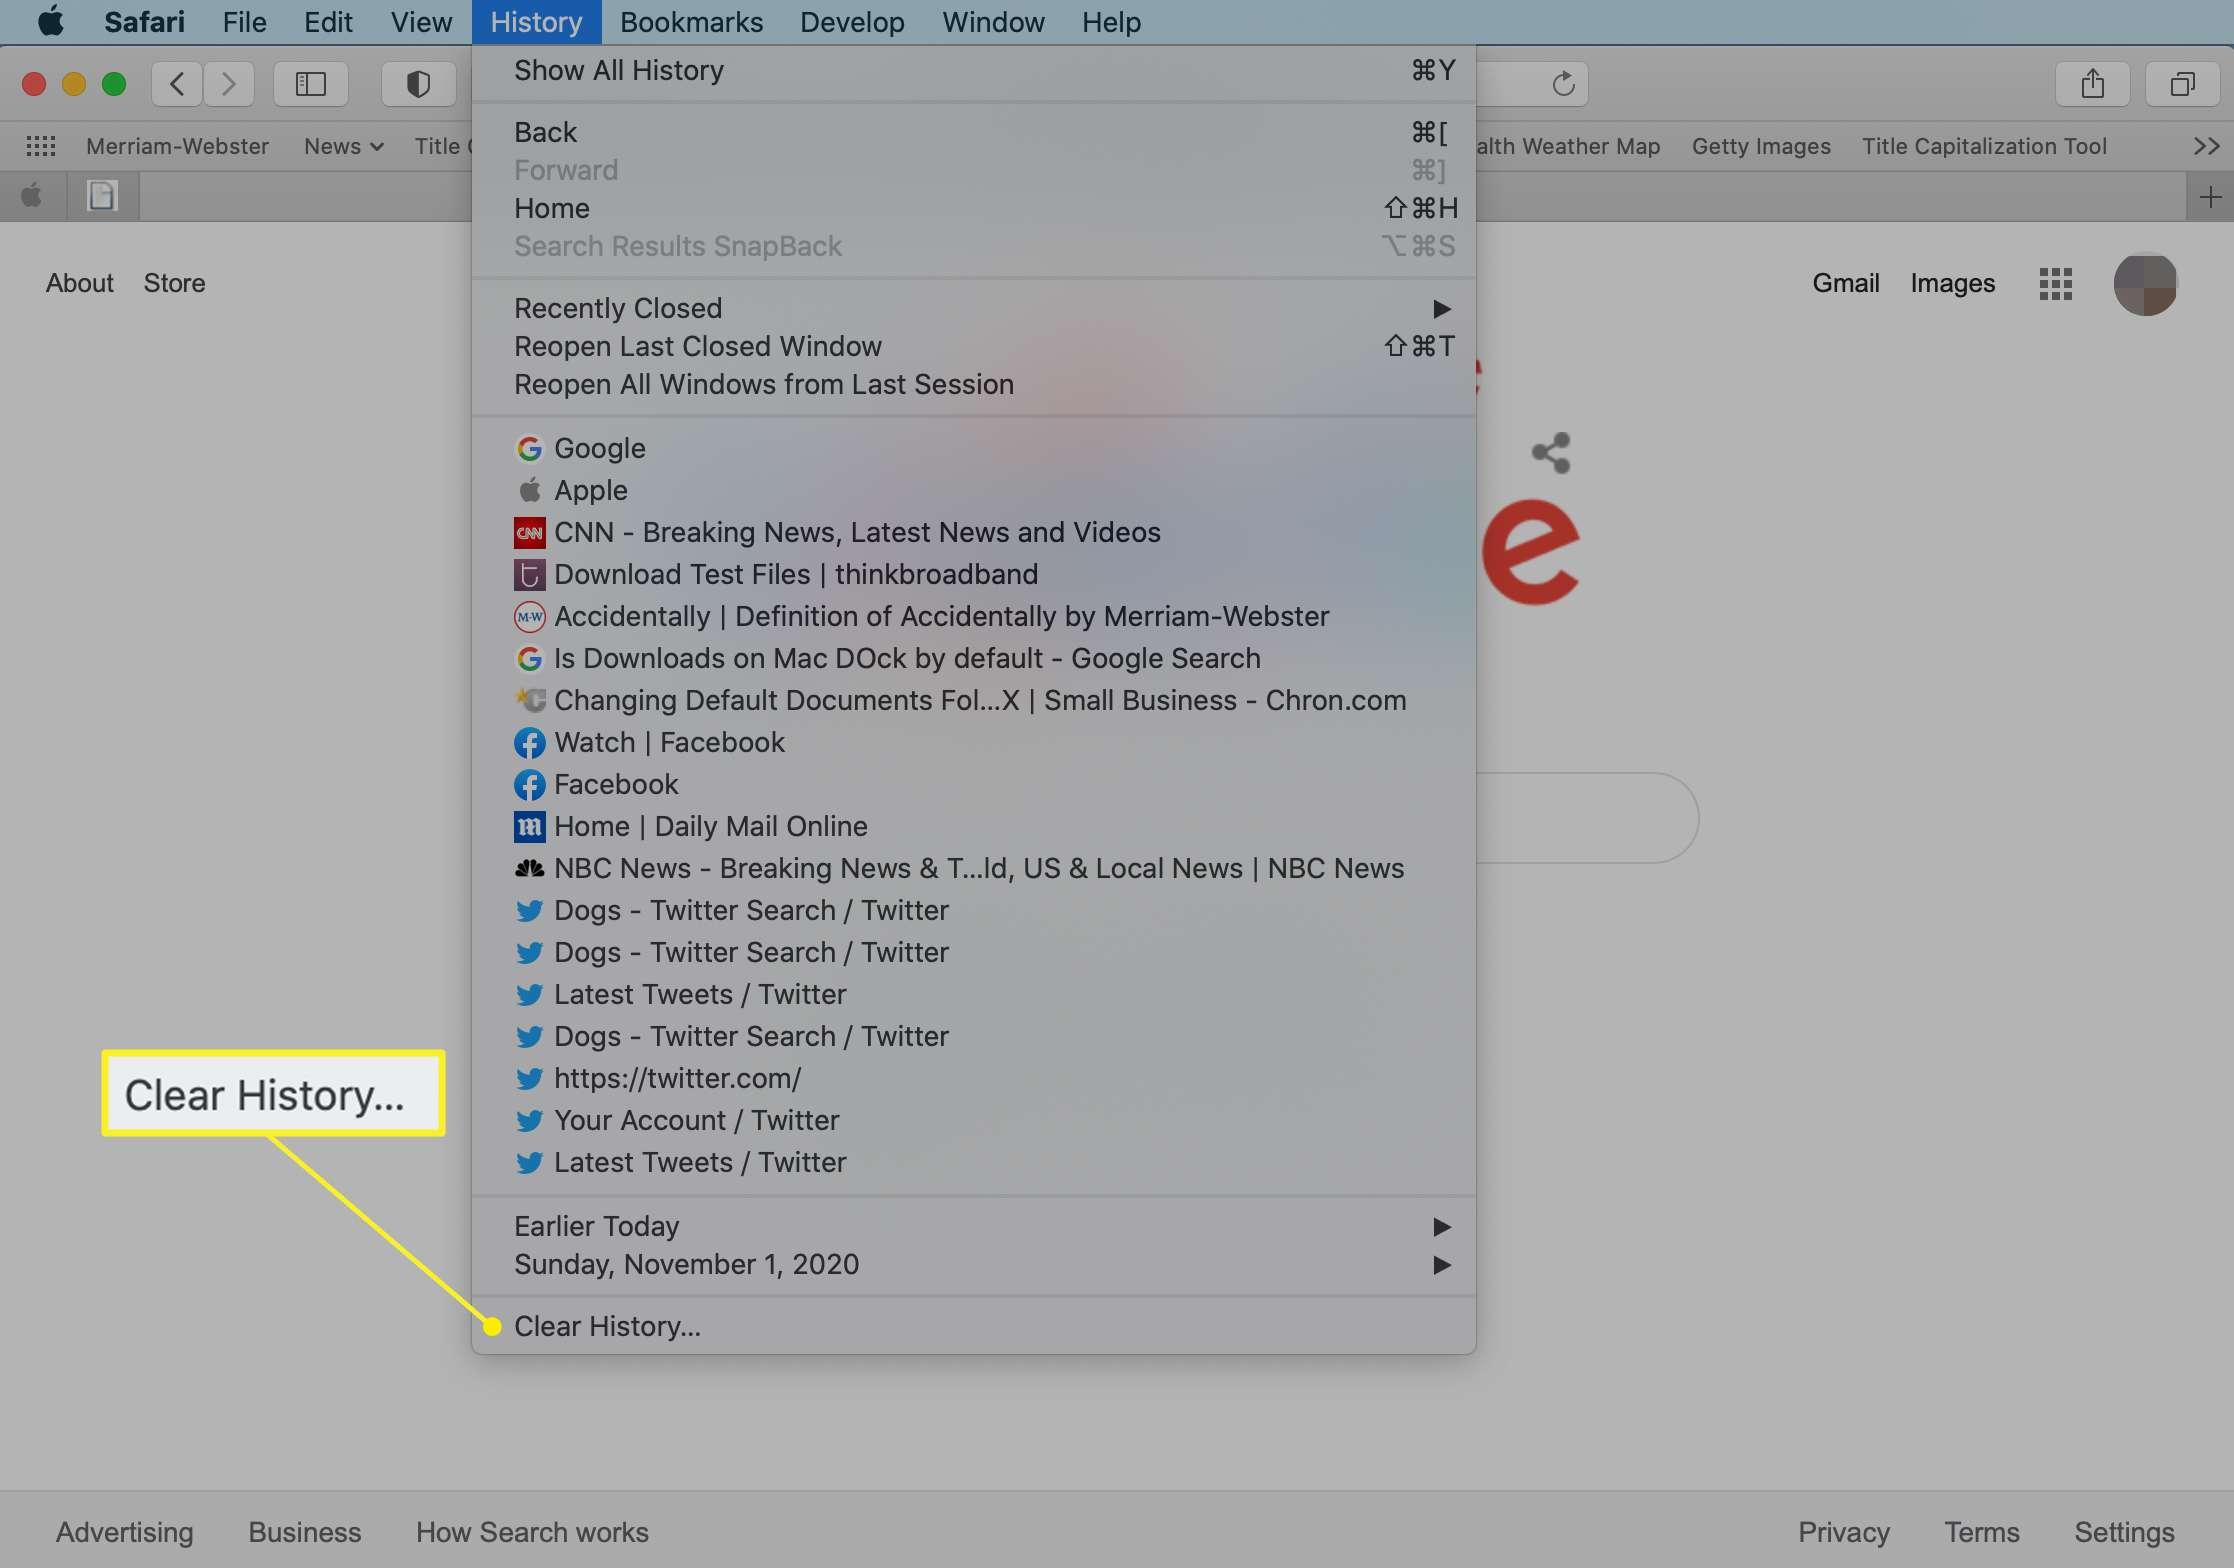 Safari History menu with Clear History highlighted